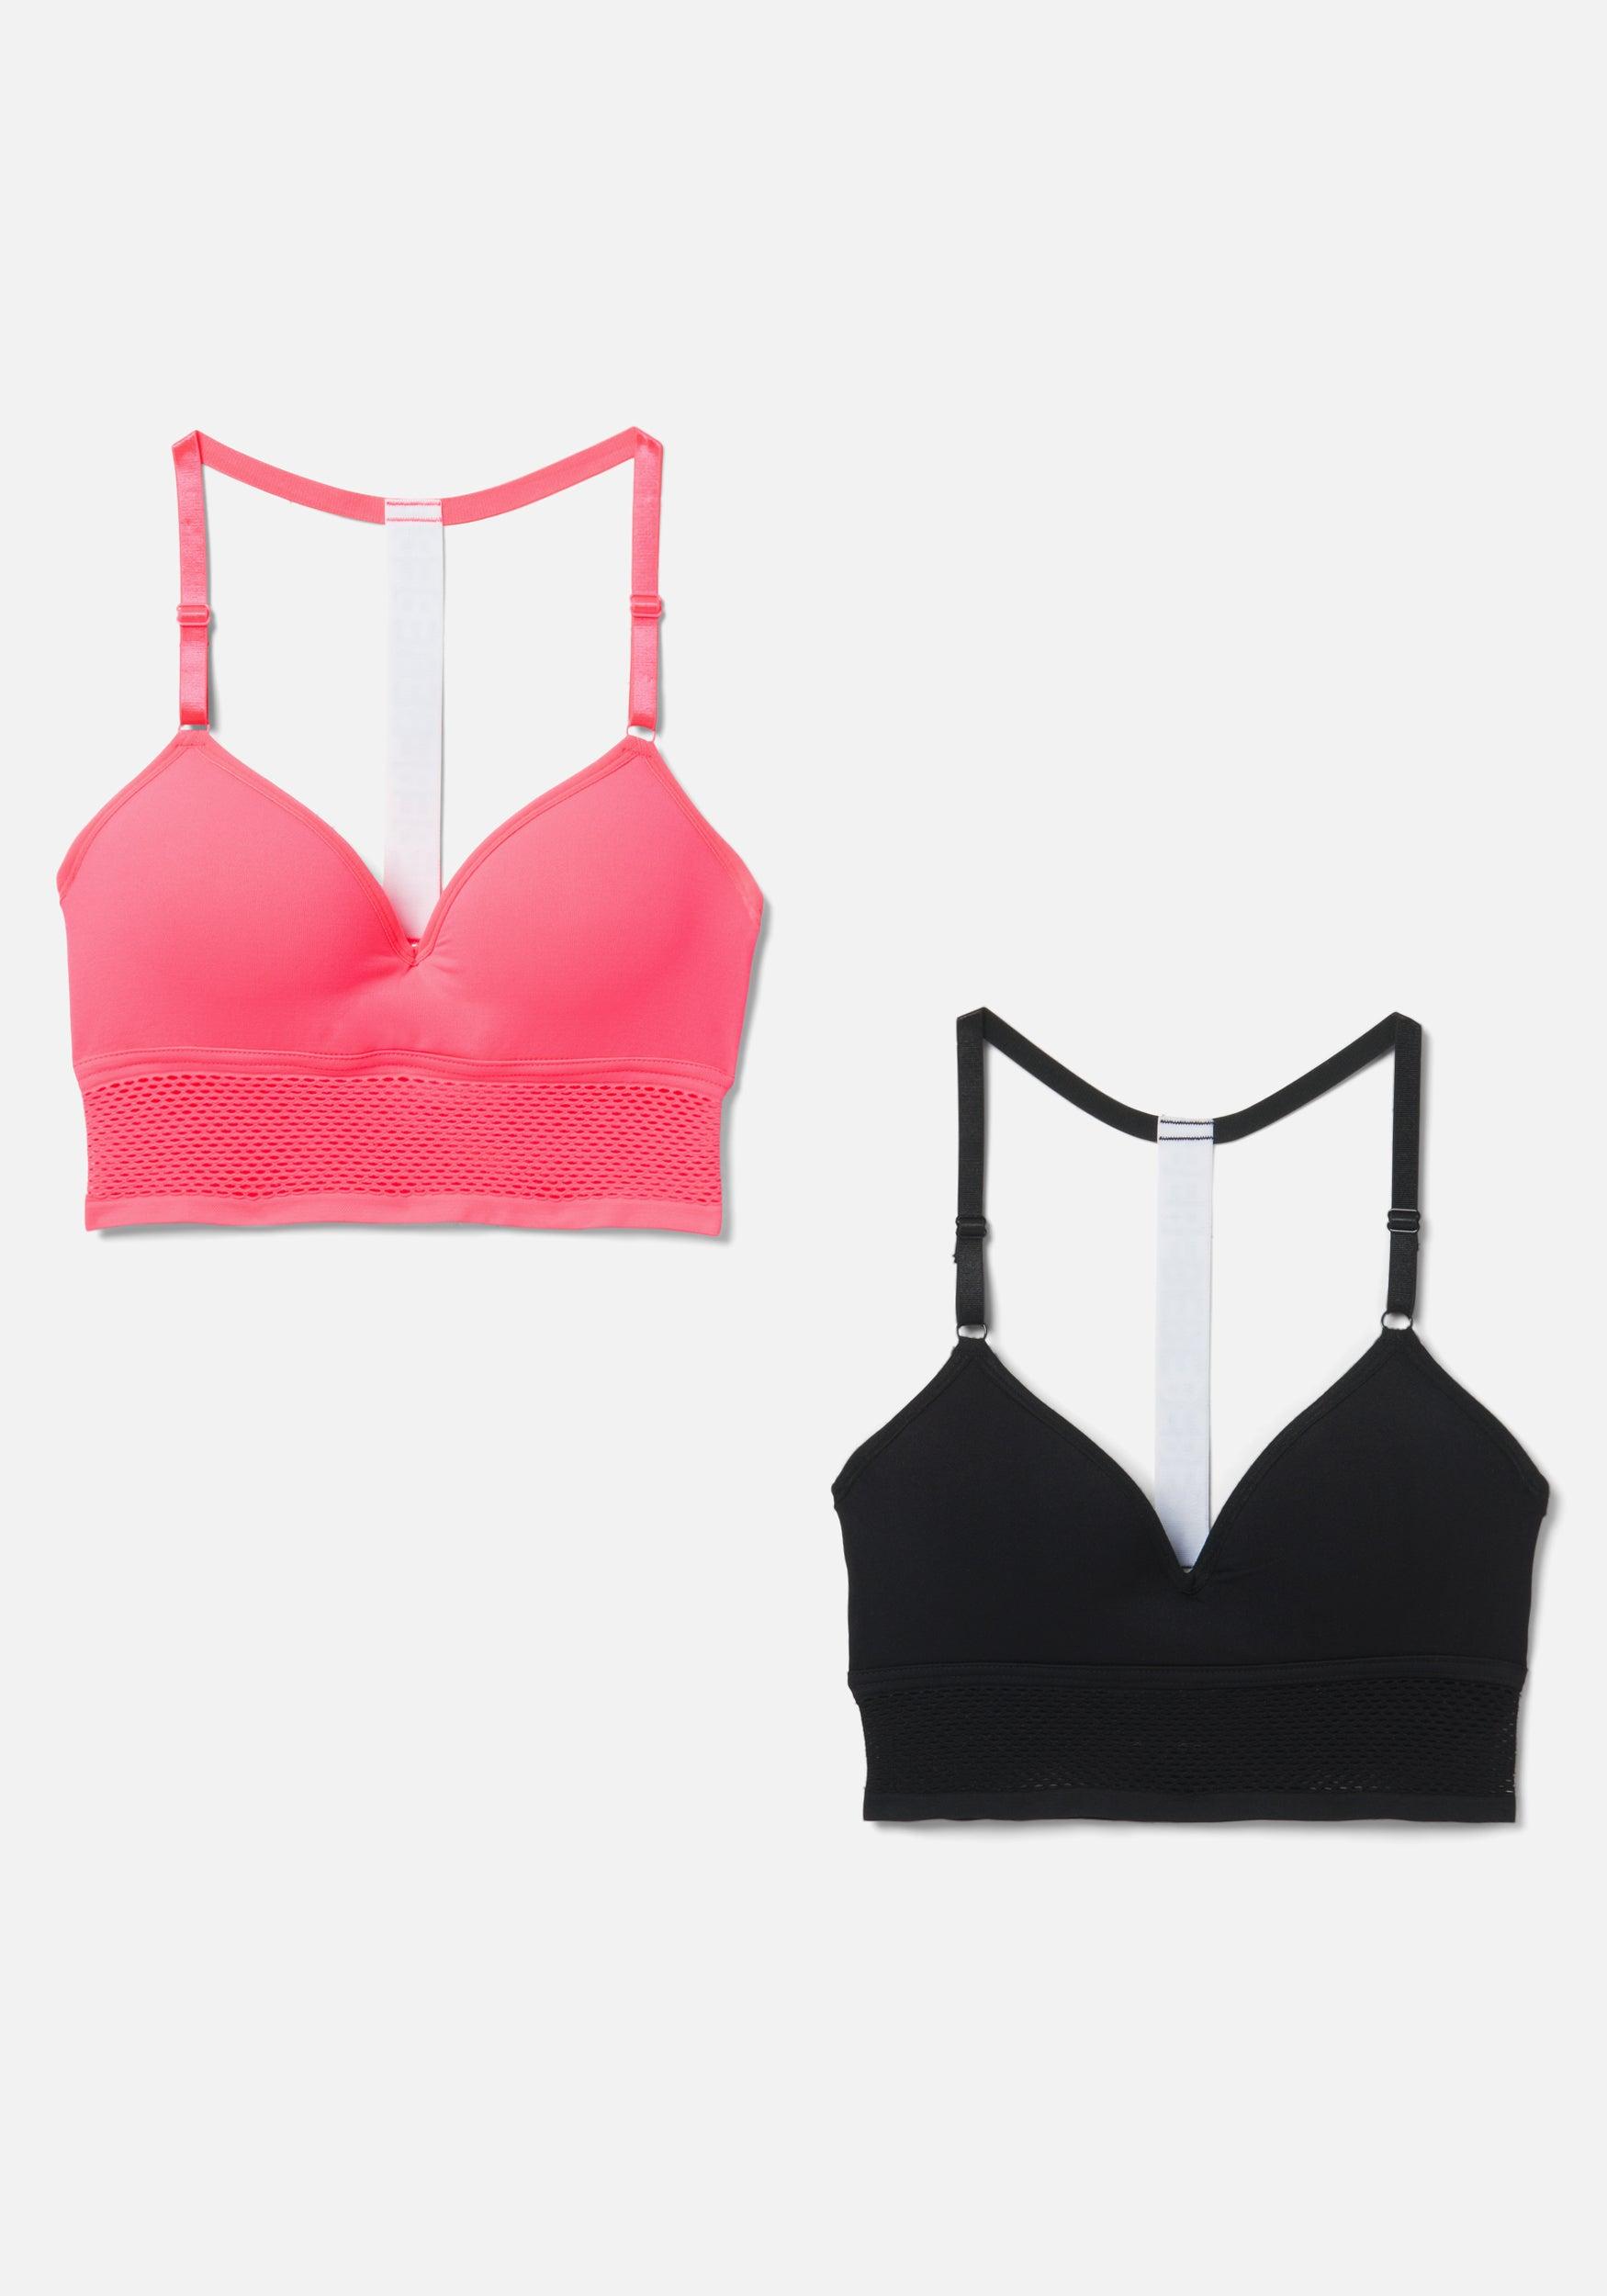 bebe Women's Bebe Logo 2 Pack Sports Bra, Size Small in Pink Glow Spandex/Nylon